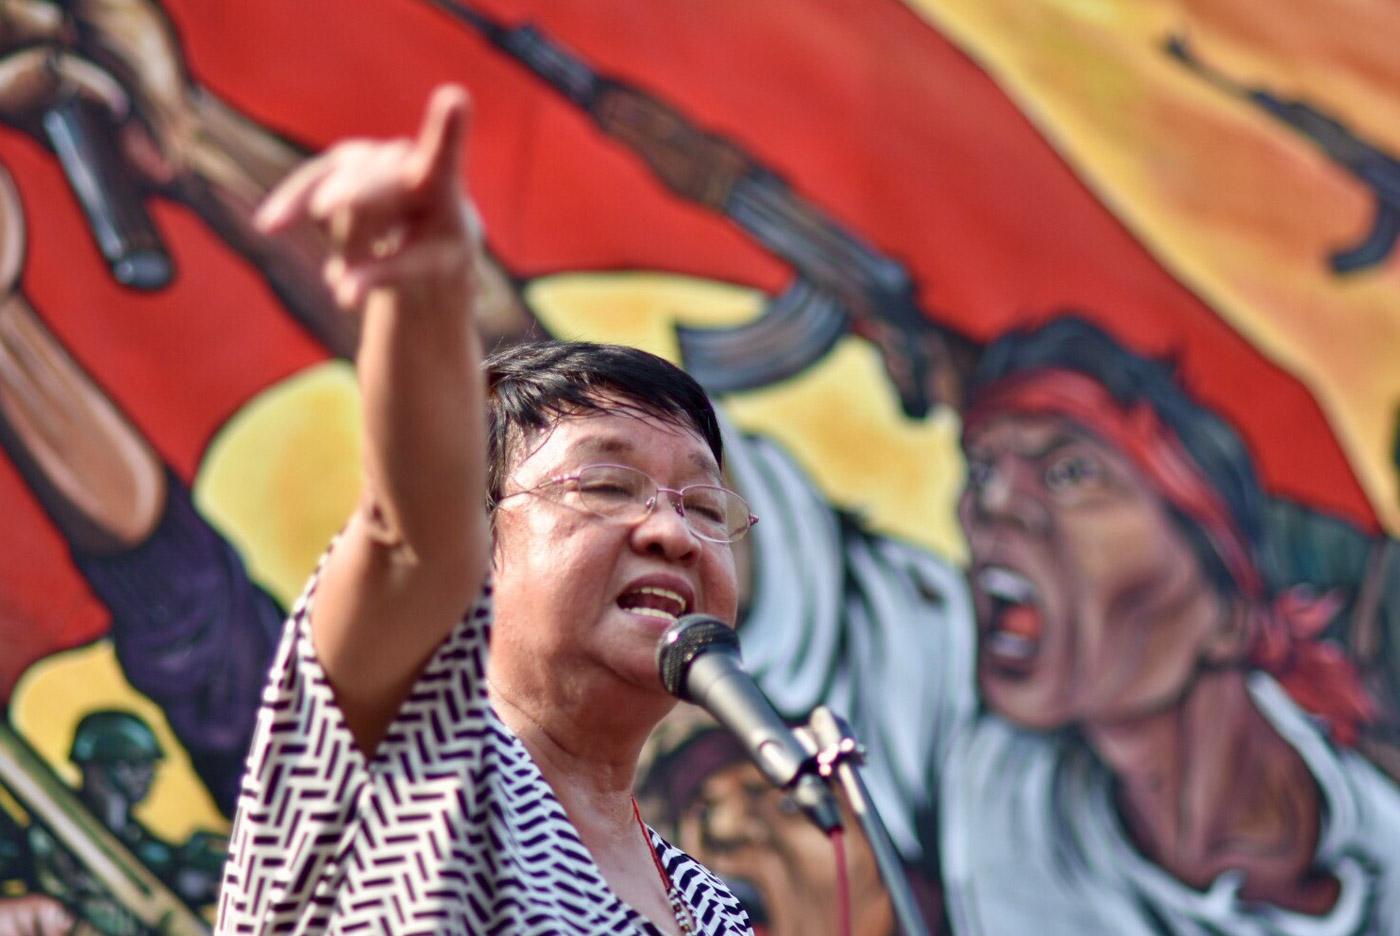 DUTERTE APPOINTEES. DSWD Secretary Judy Taguiwalo speaking at the Liwasang Bonifacio rally. DAR Secretary Rafael Mariano also showed up. Photo by LeAnne Jazul/Rappler